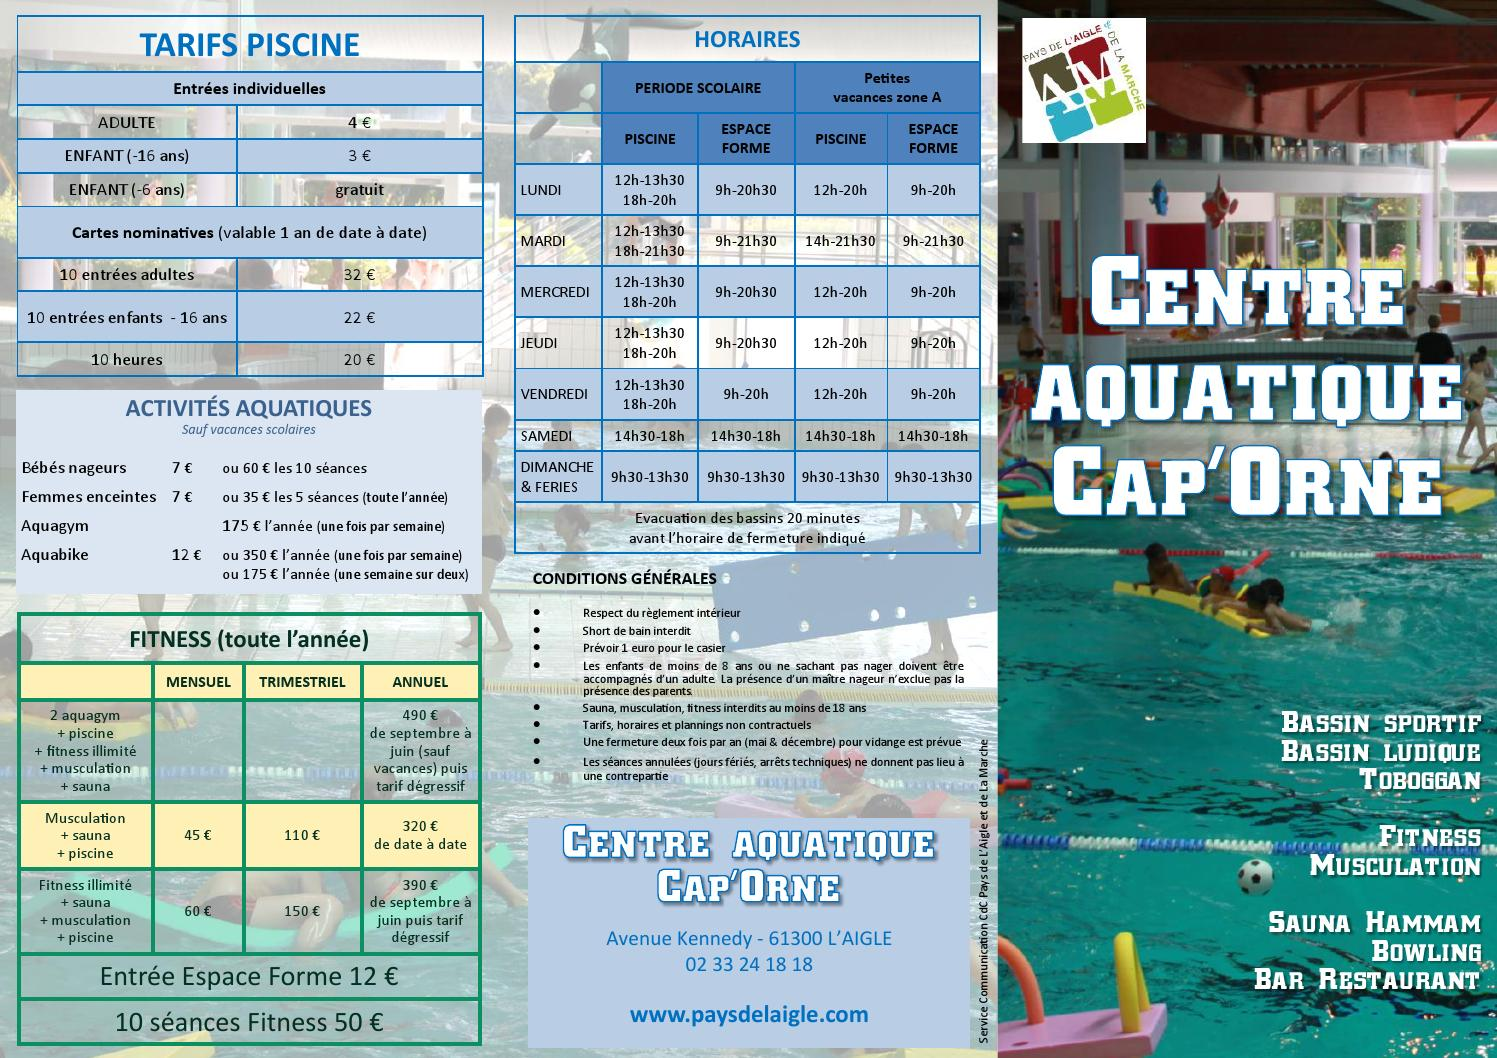 Issuu flyer general piscine sept 2014 by pays de l 39 aigle for Piscine l aigle